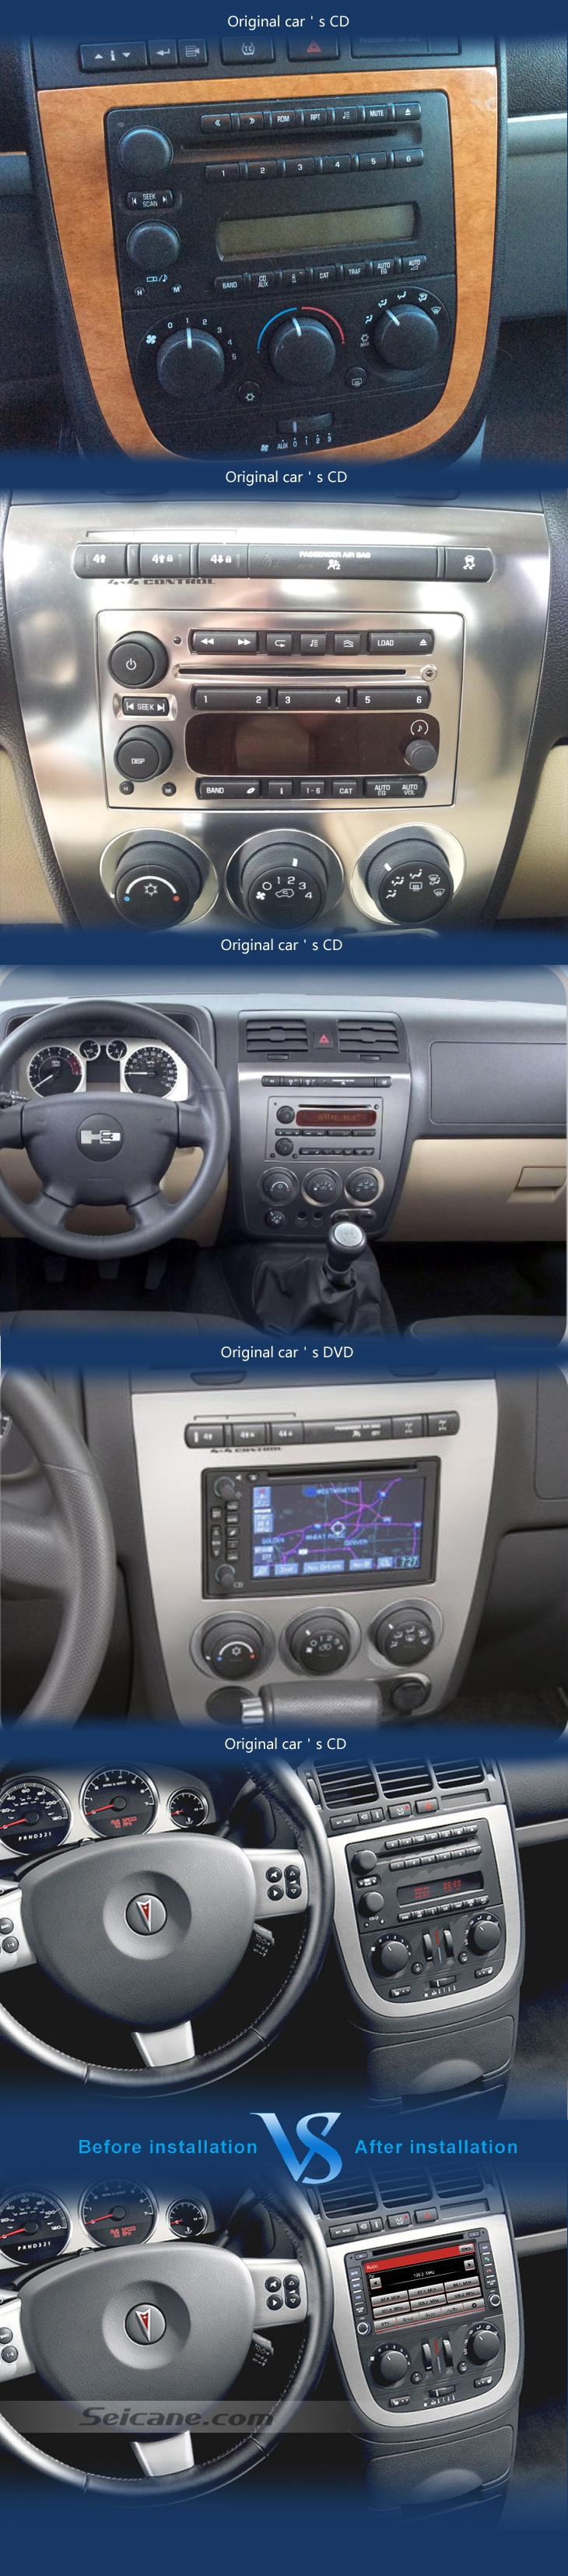 Pontiac Montana SV6 car dvd after installation